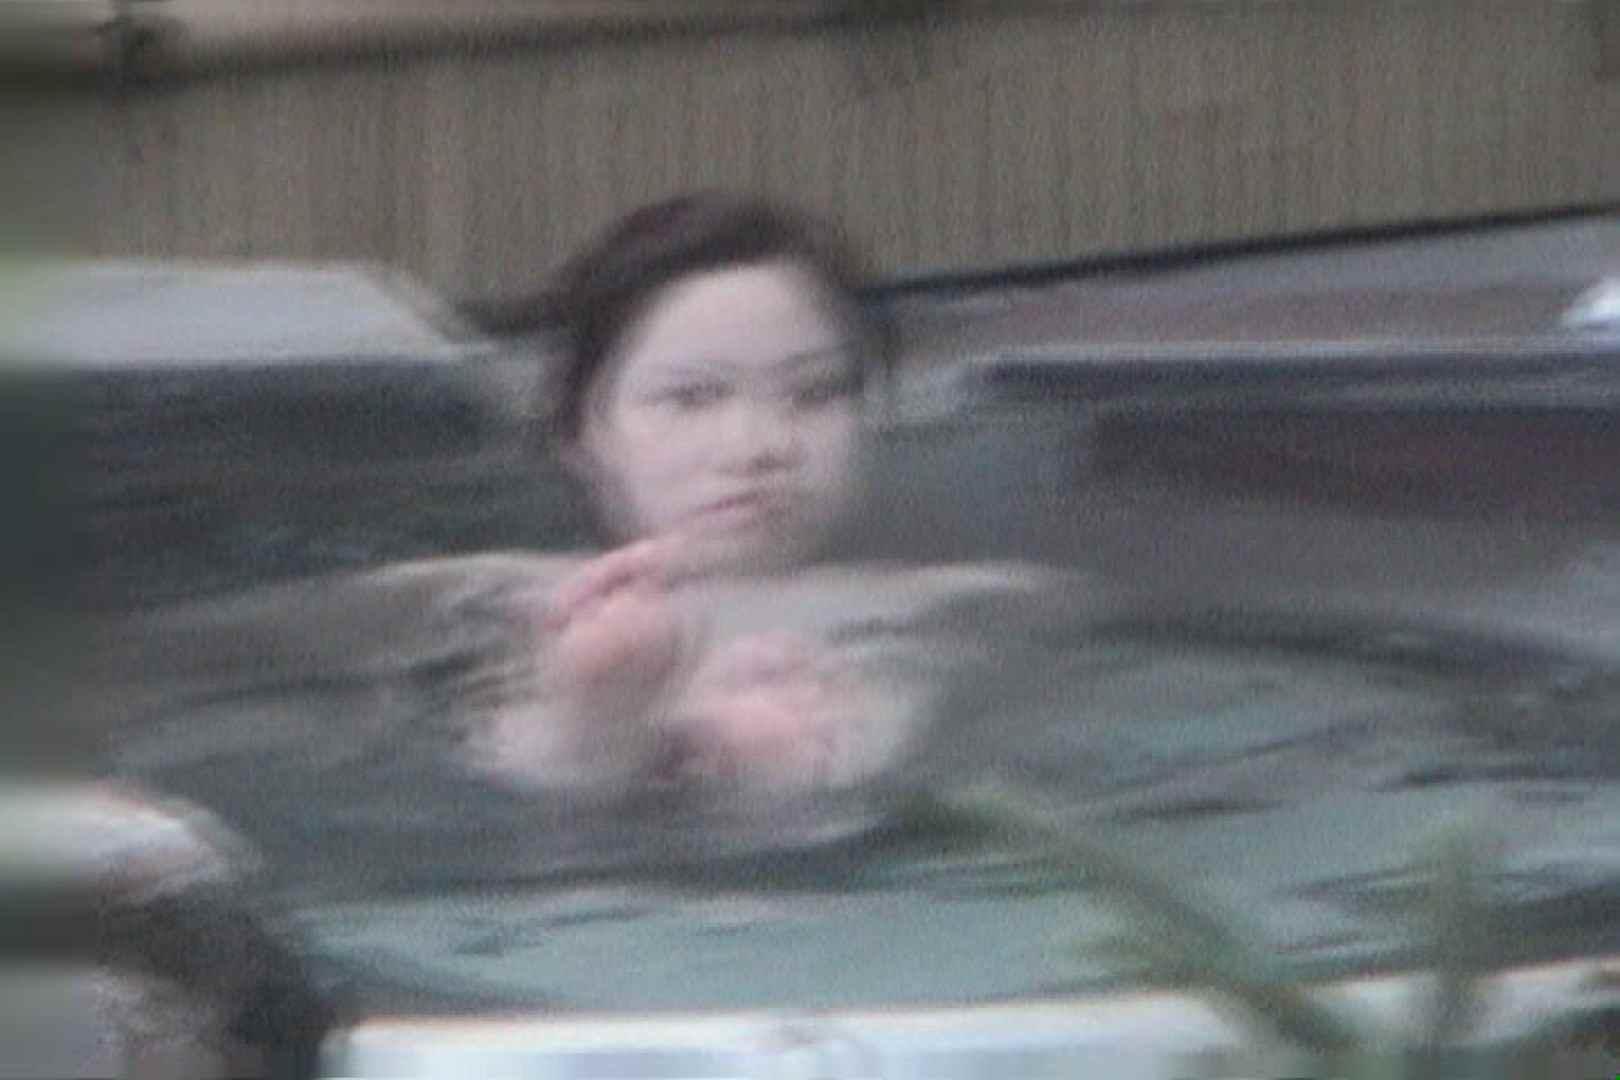 Aquaな露天風呂Vol.602 露天風呂編  83PIX 46